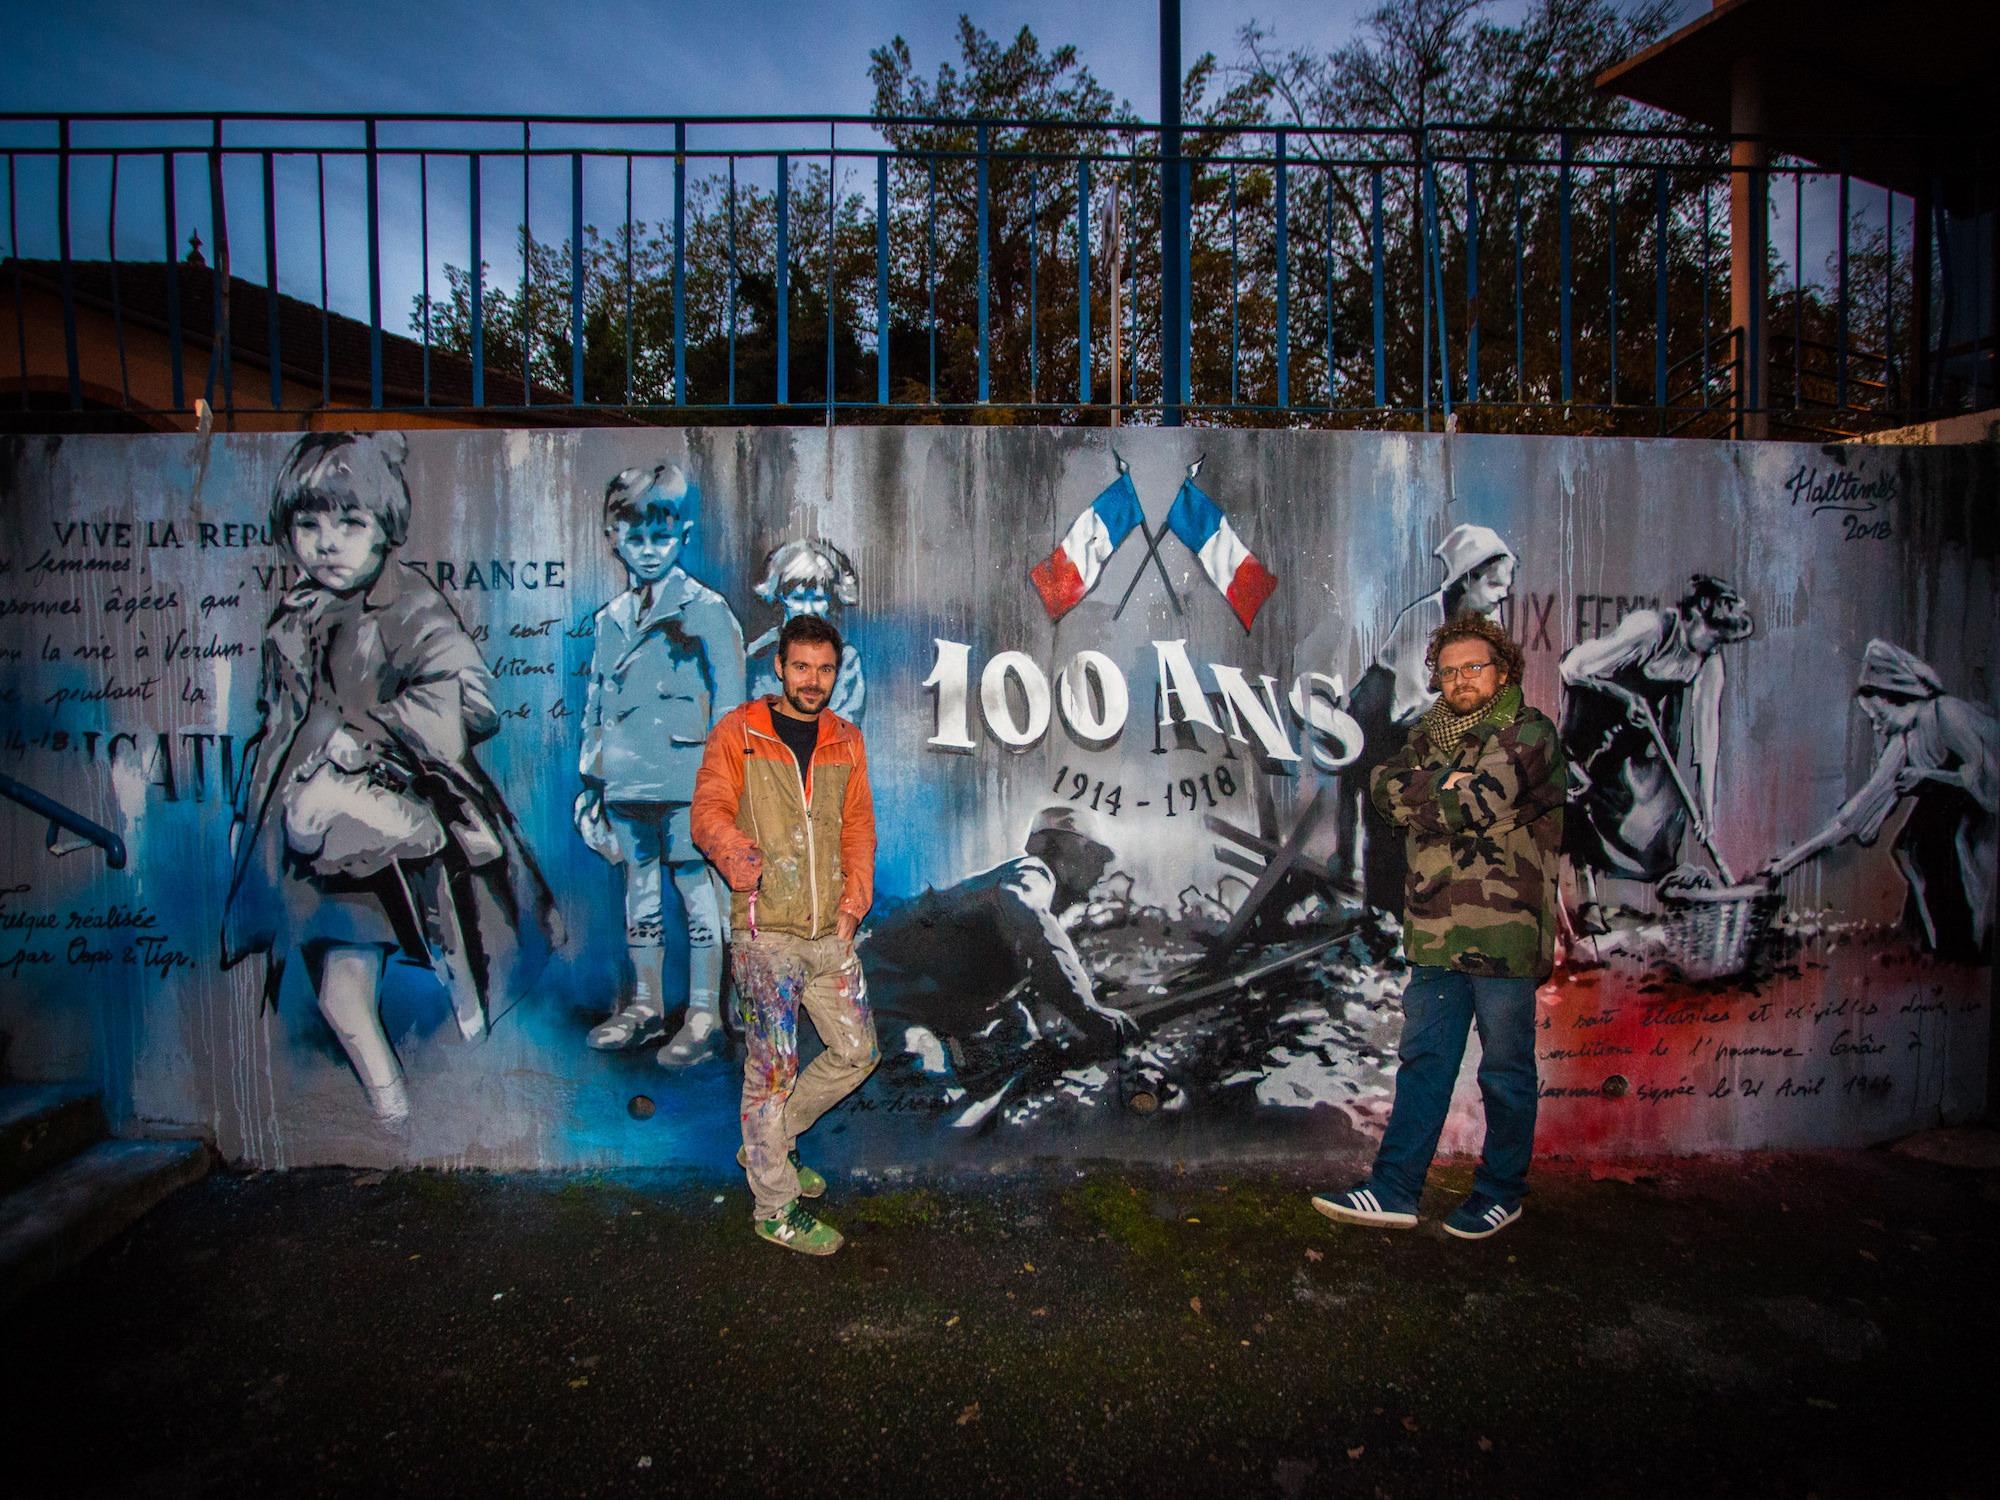 hommage-1ere-guerre-mondiale-art-graffiti-verdun-sur-garonne